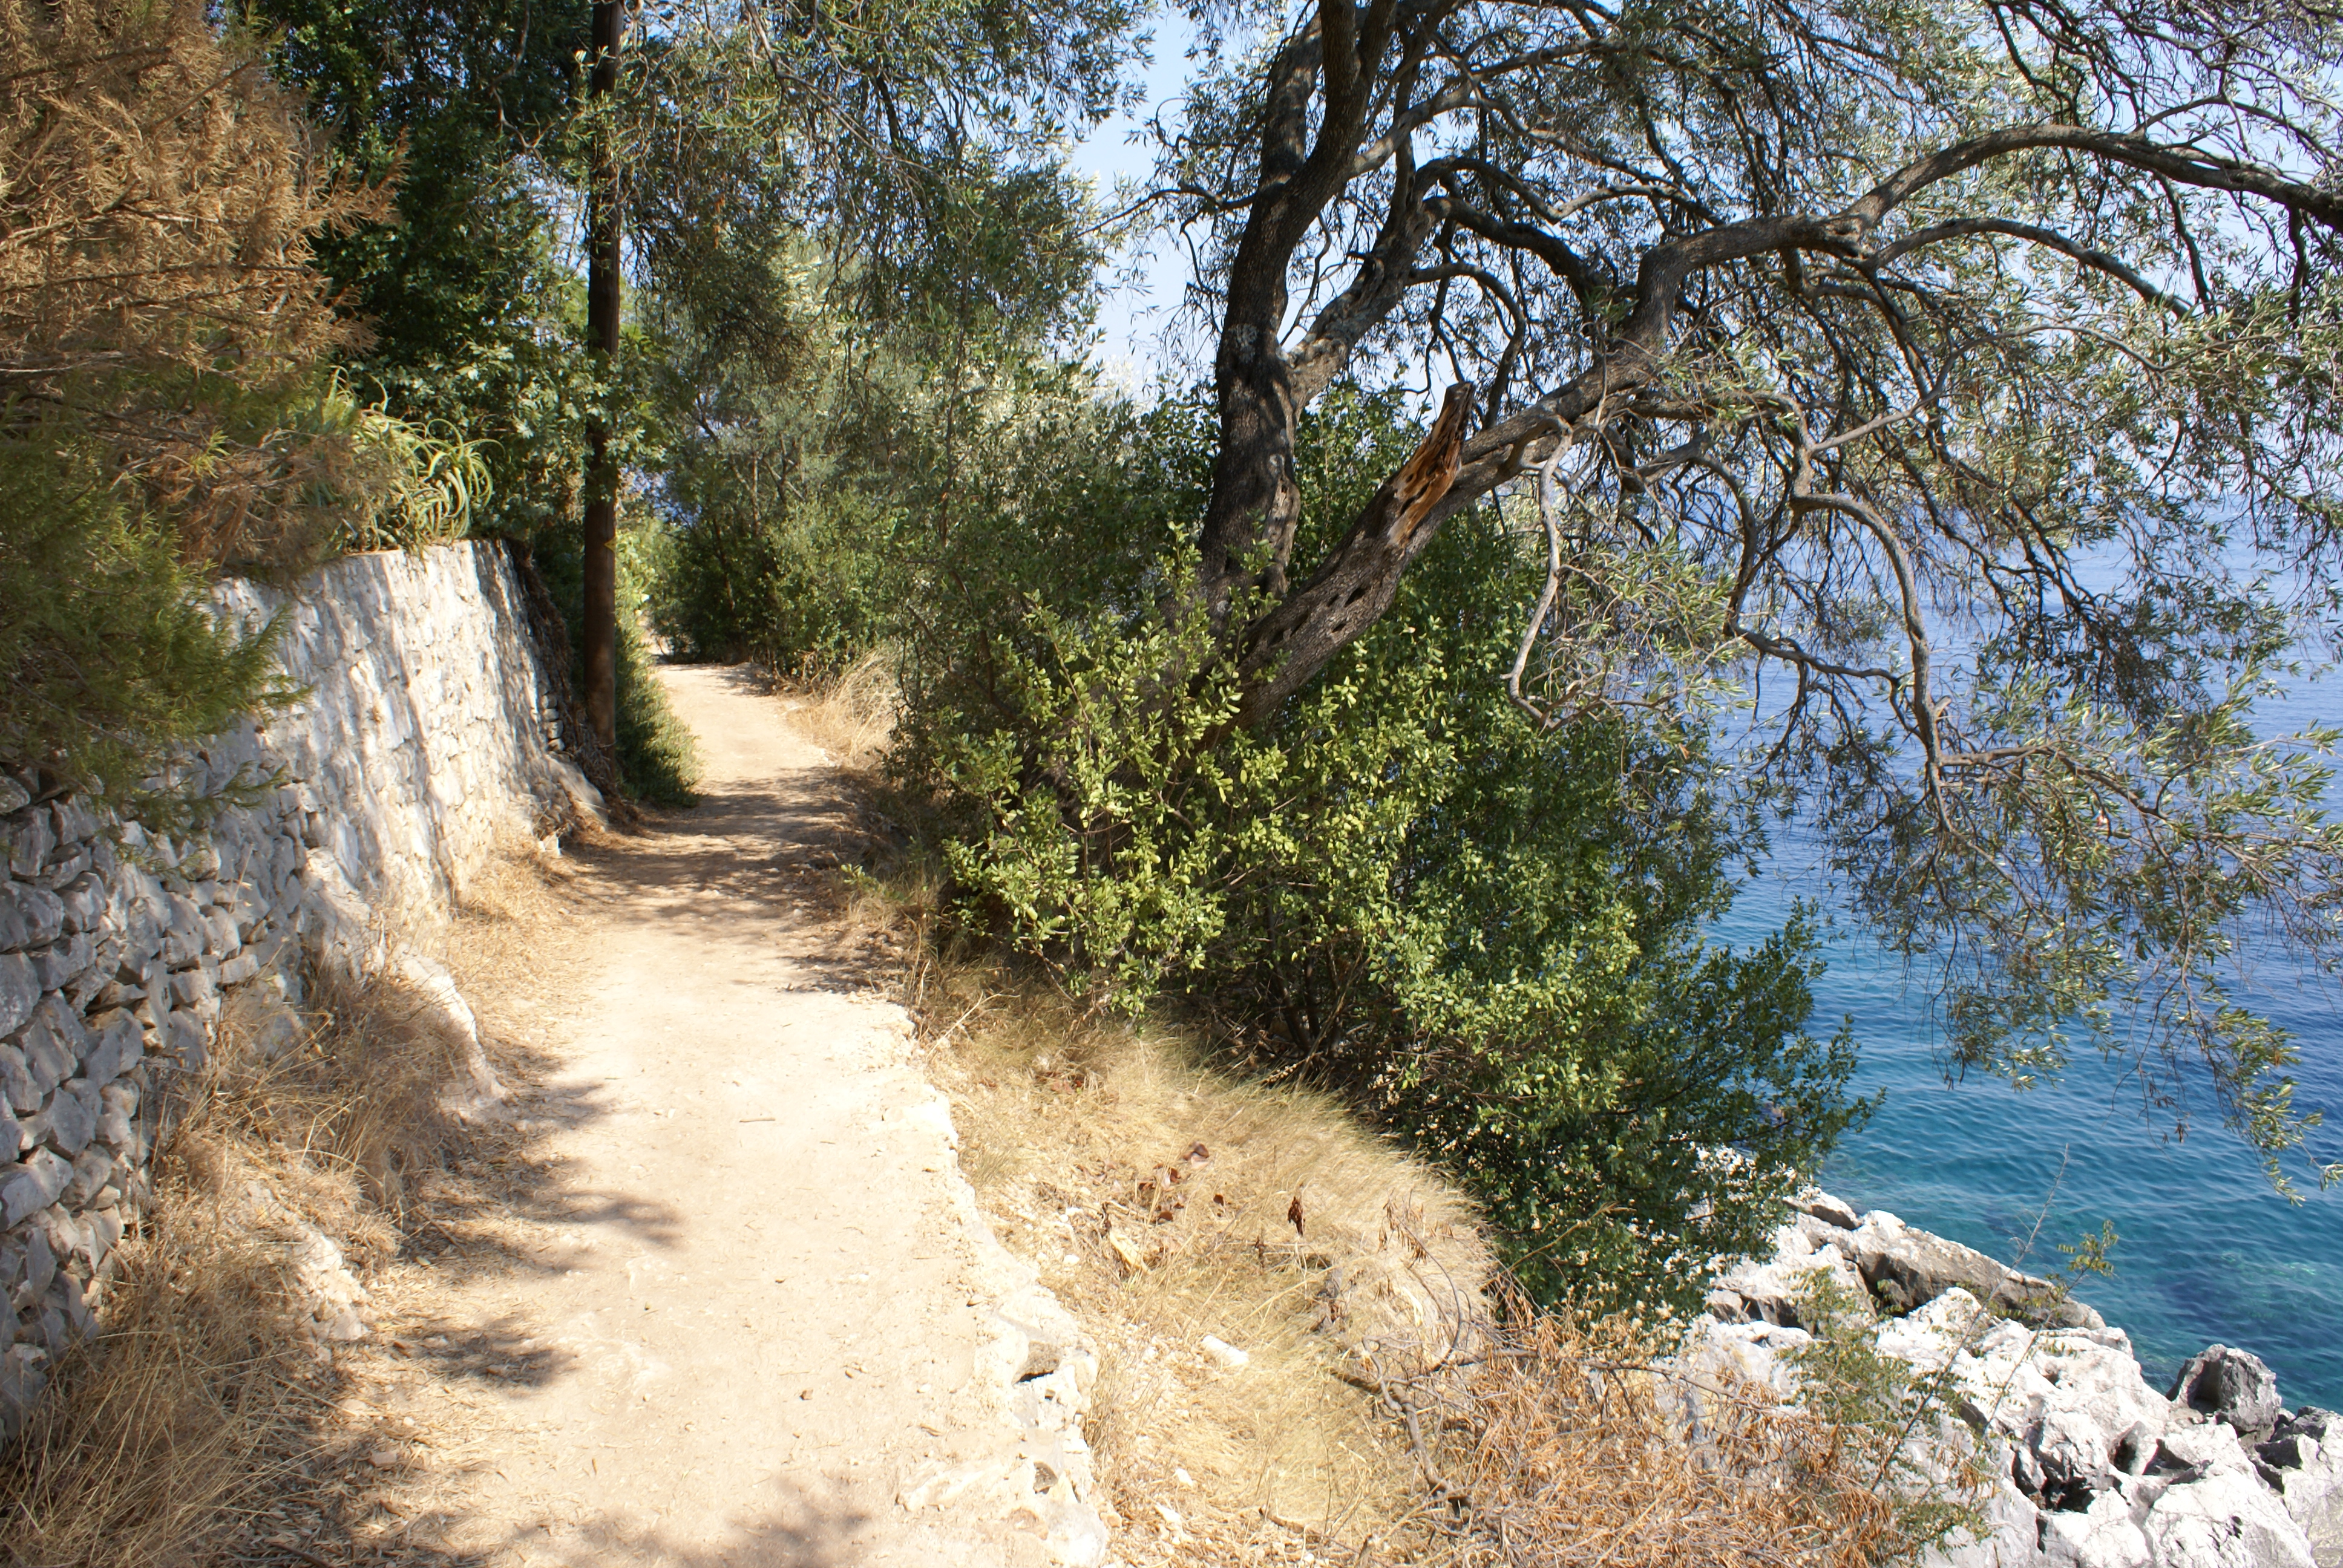 Strandweg von Nissaki - Balkon - Korfu Ferienhaus Villa Adonis mit Pool, Nissaki, KorfuCorfu.de